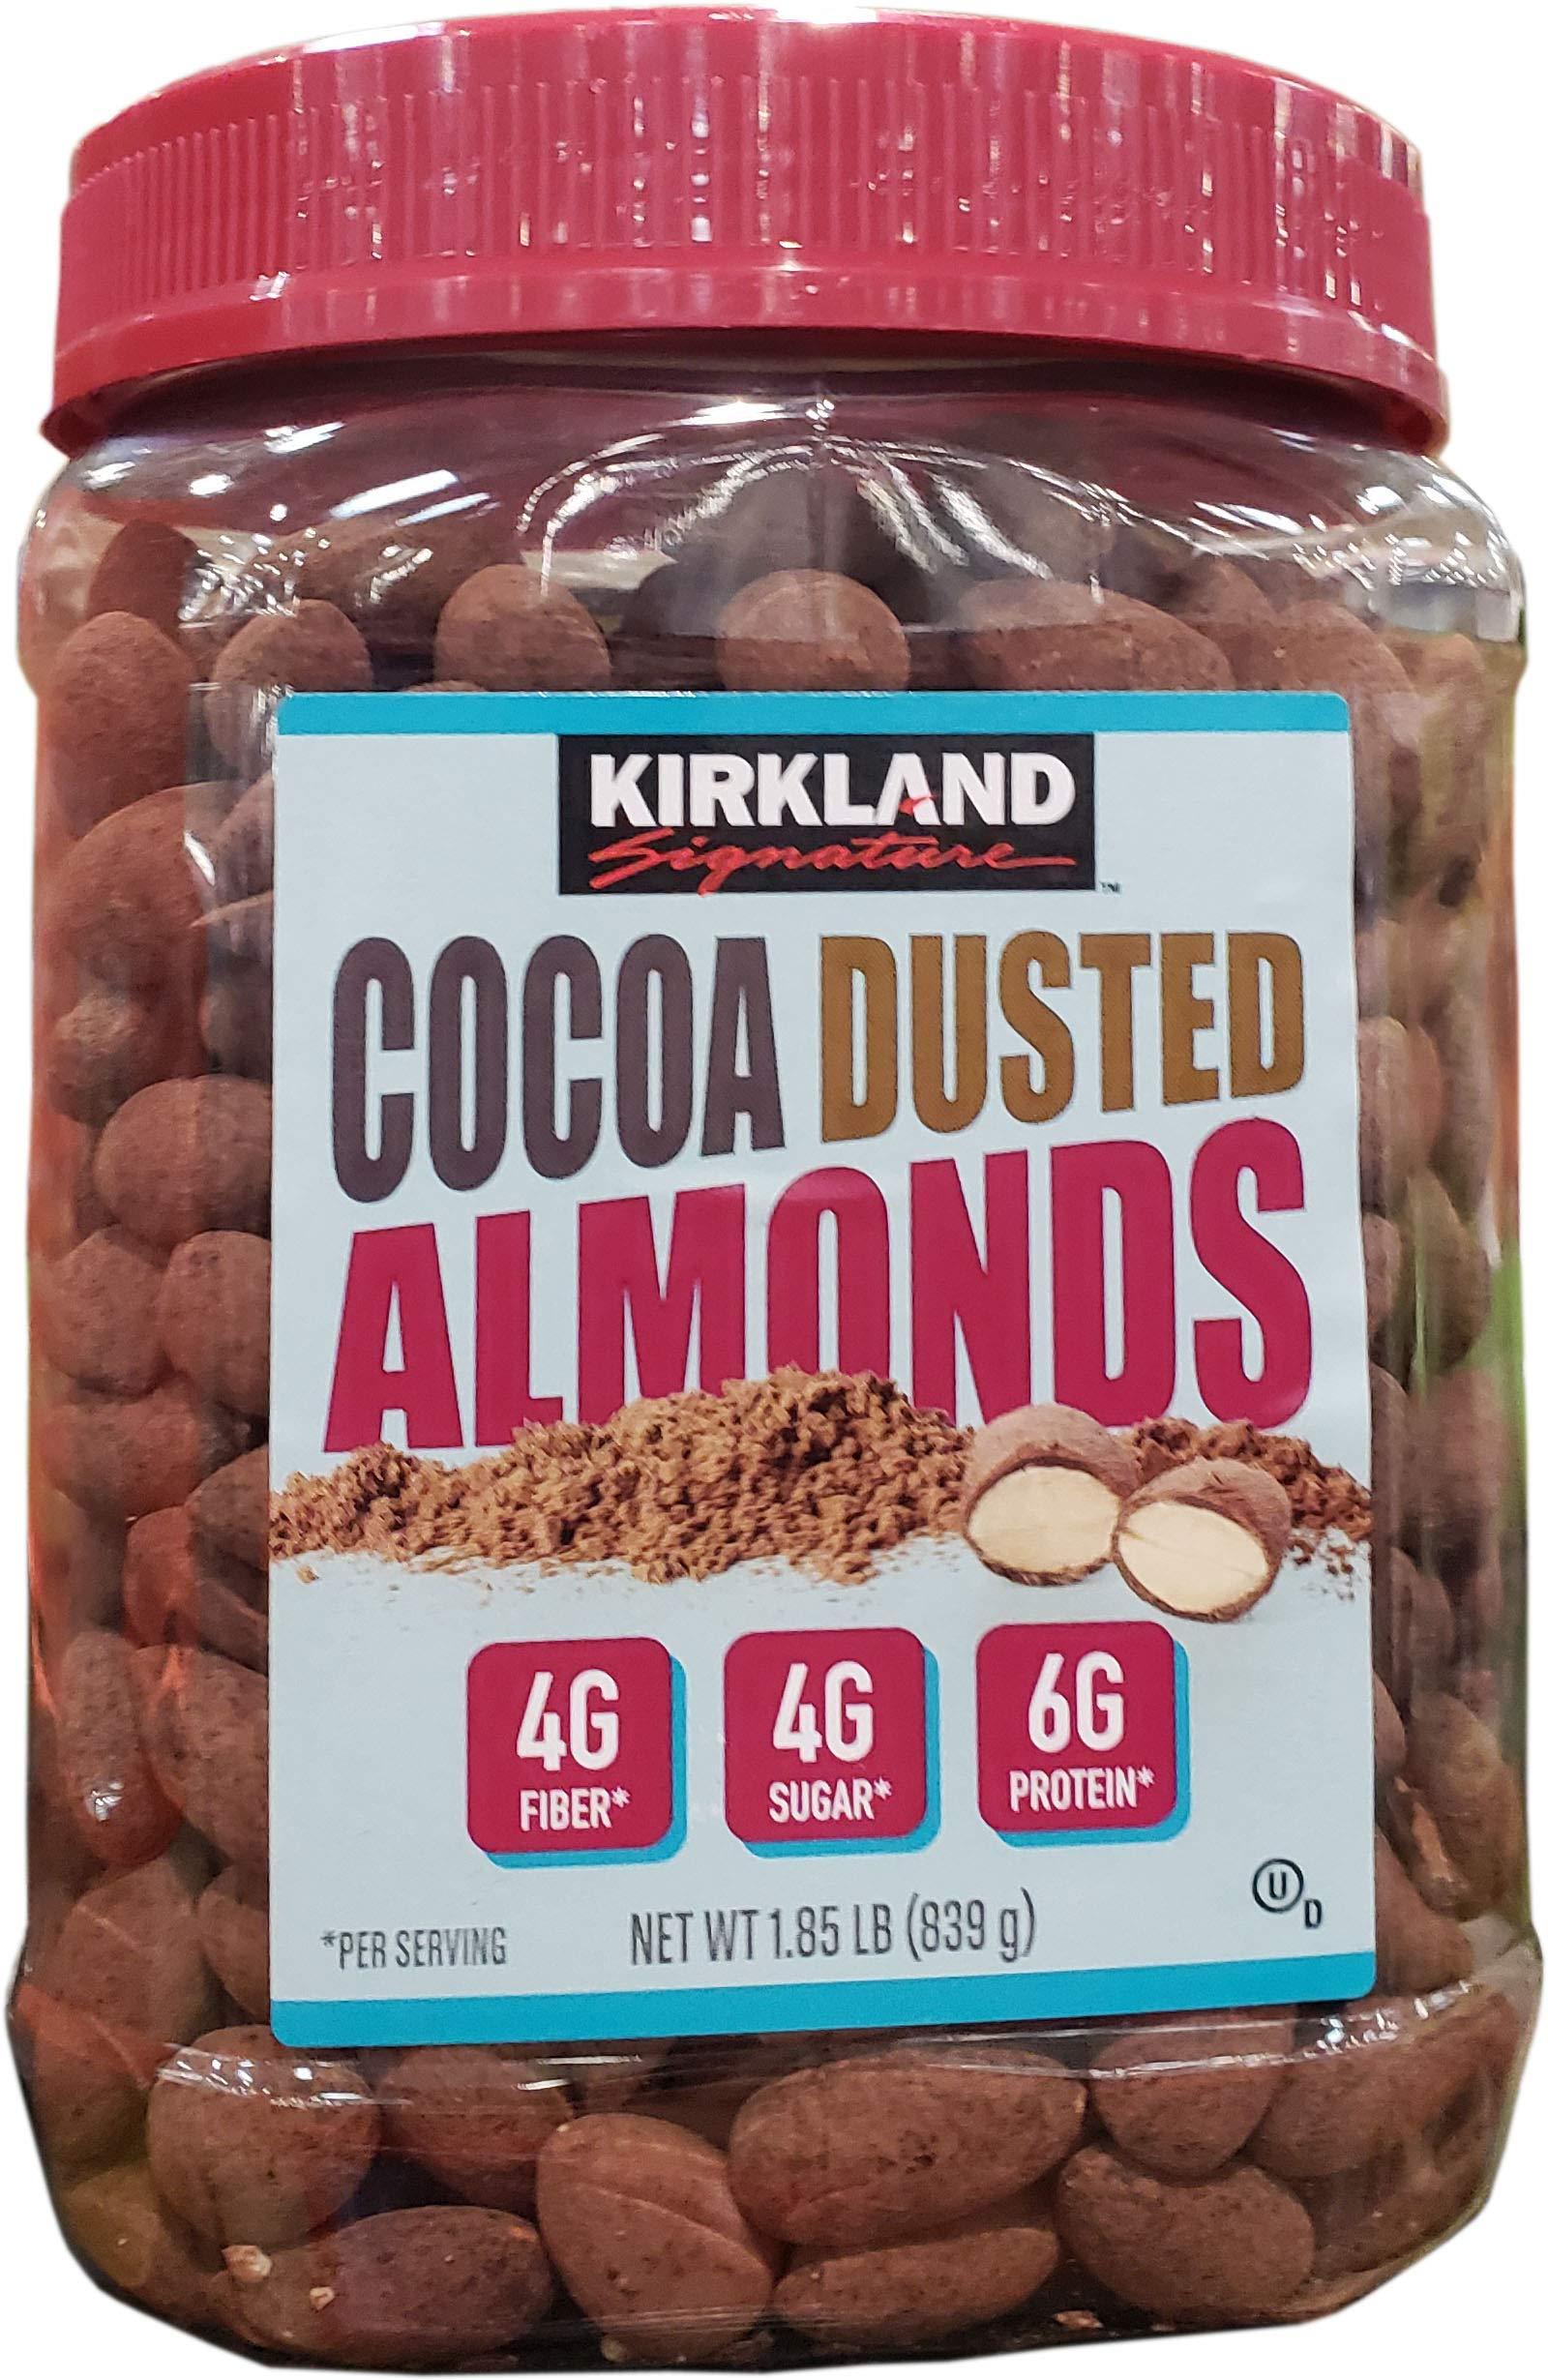 Kirkland Signature Cocoa Dusted Almonds, 29.6 Ounce by Kirkland Signature (Image #1)